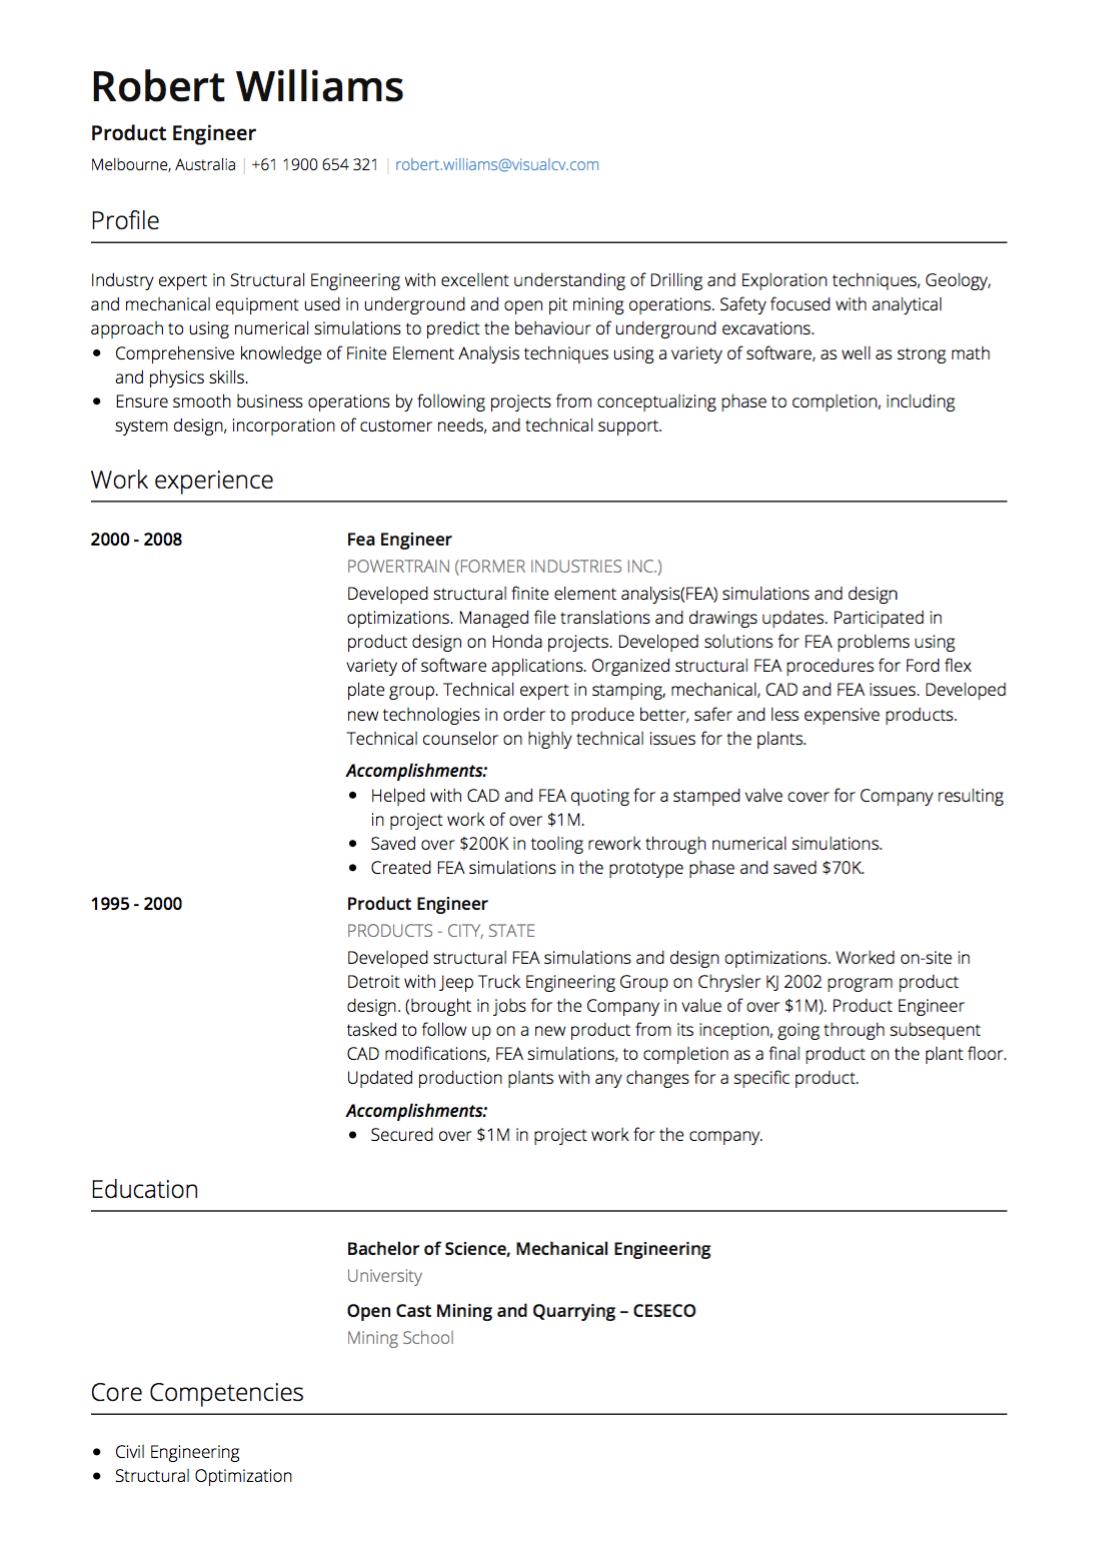 Cv Template Australia Andriblog.design in 2020 Resume